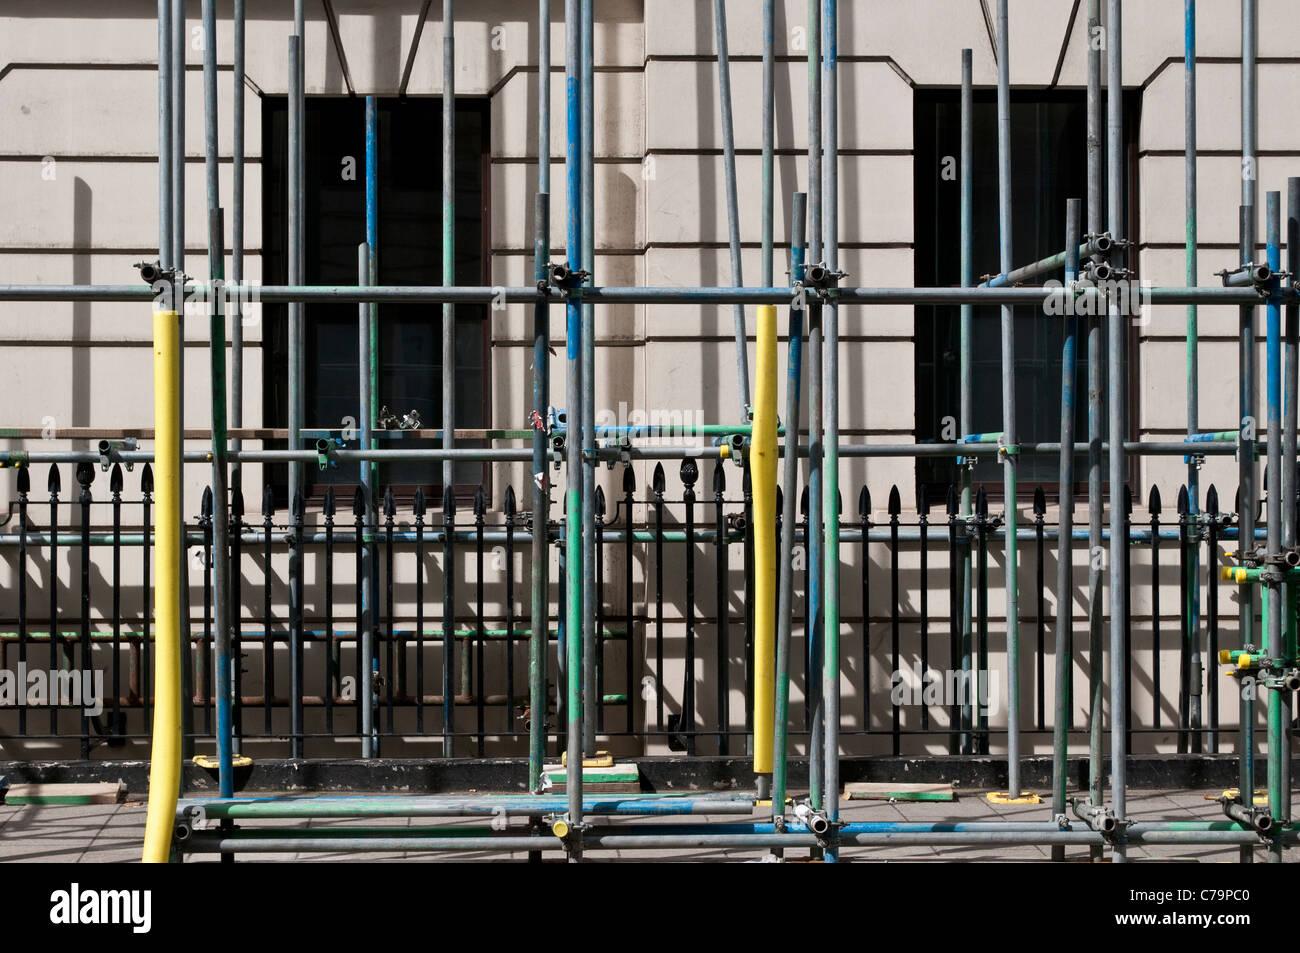 Scaffolding, London, WC1, UK - Stock Image